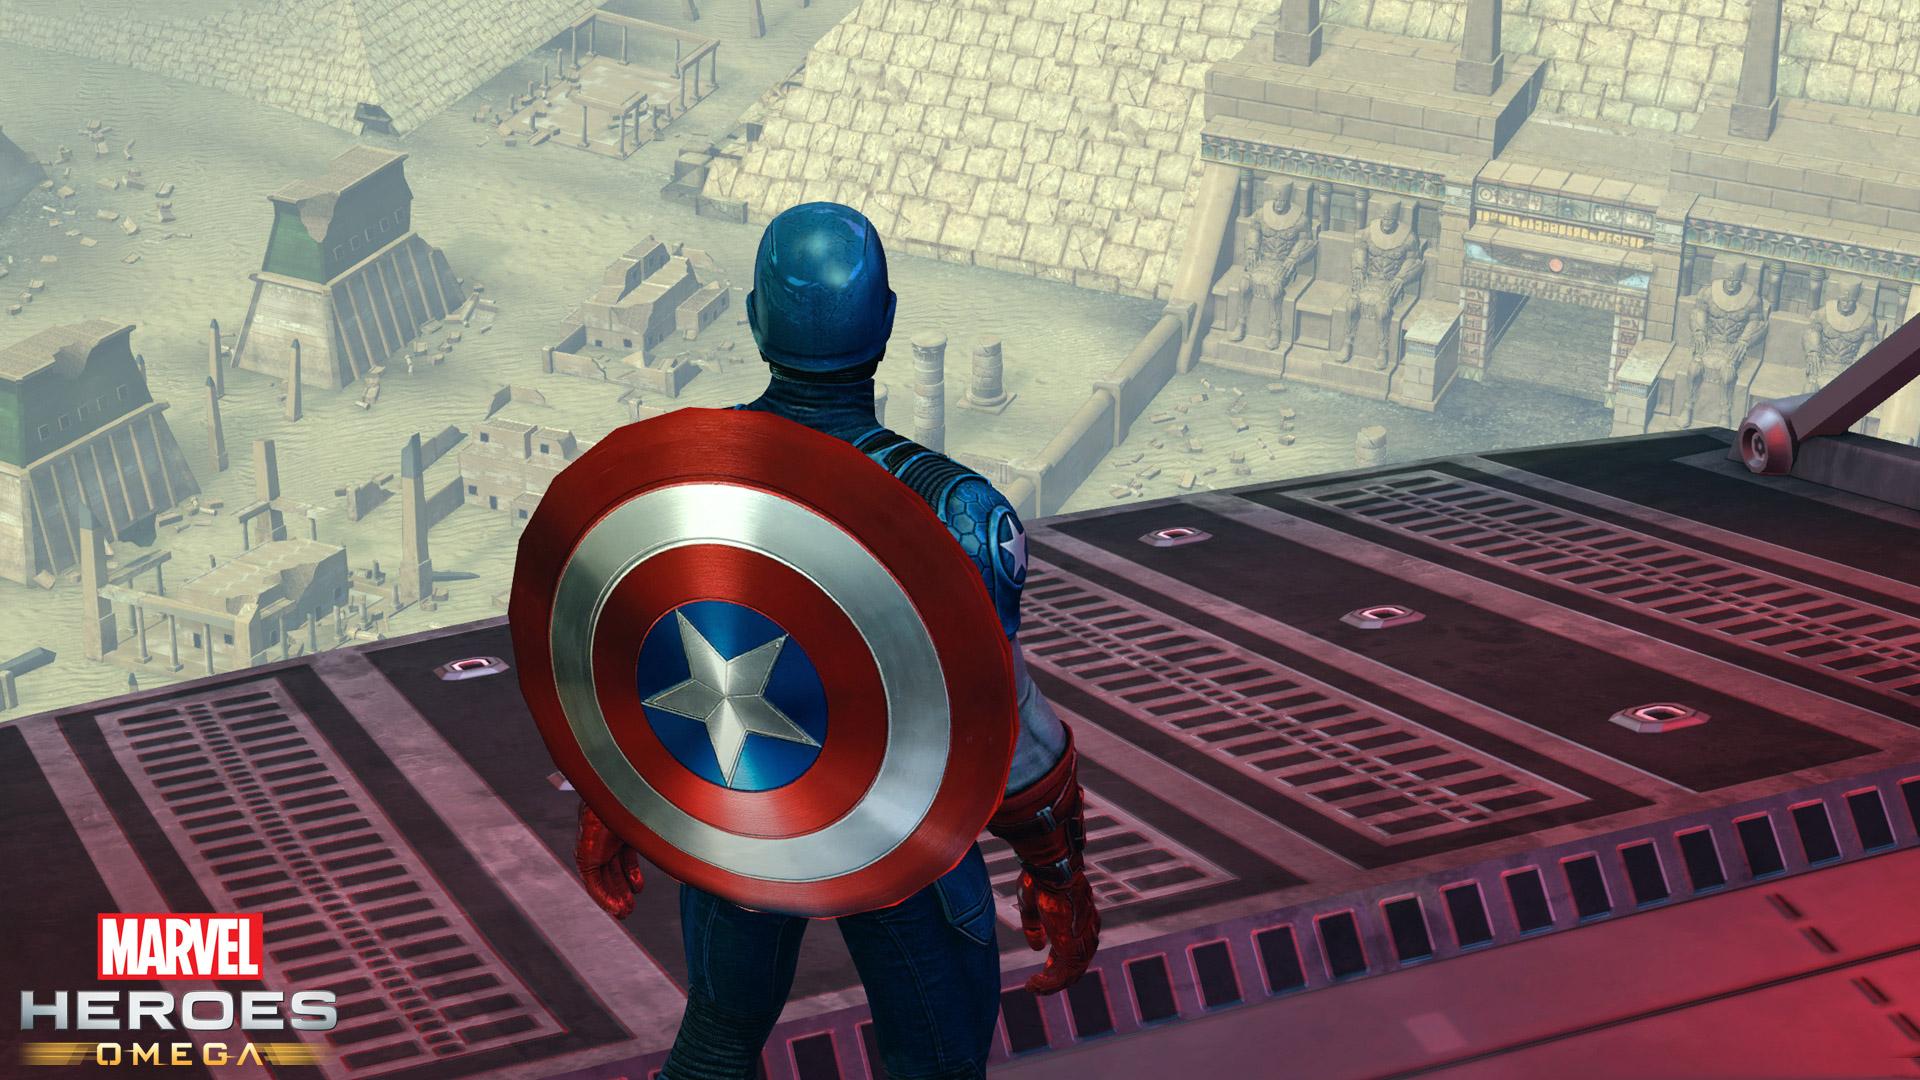 Marvel Heroes Wallpaper in 1920x1080